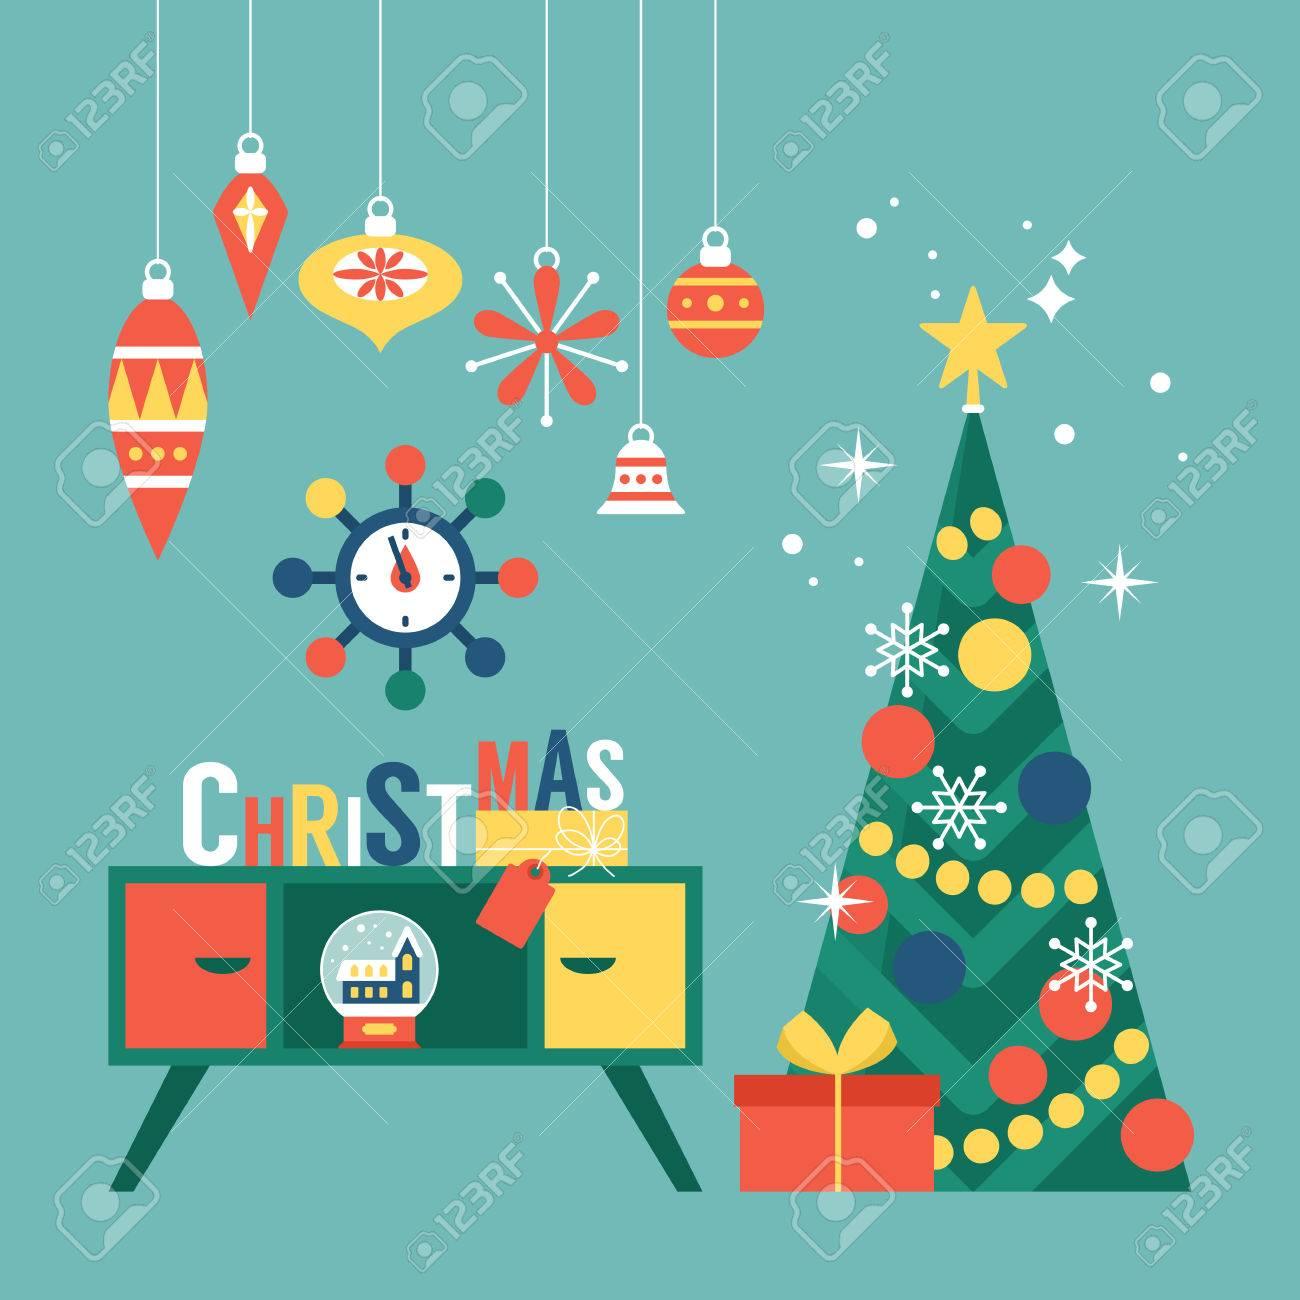 Christmas Greeting Cards.Modern Creative Christmas Greeting Card Design With Christmas